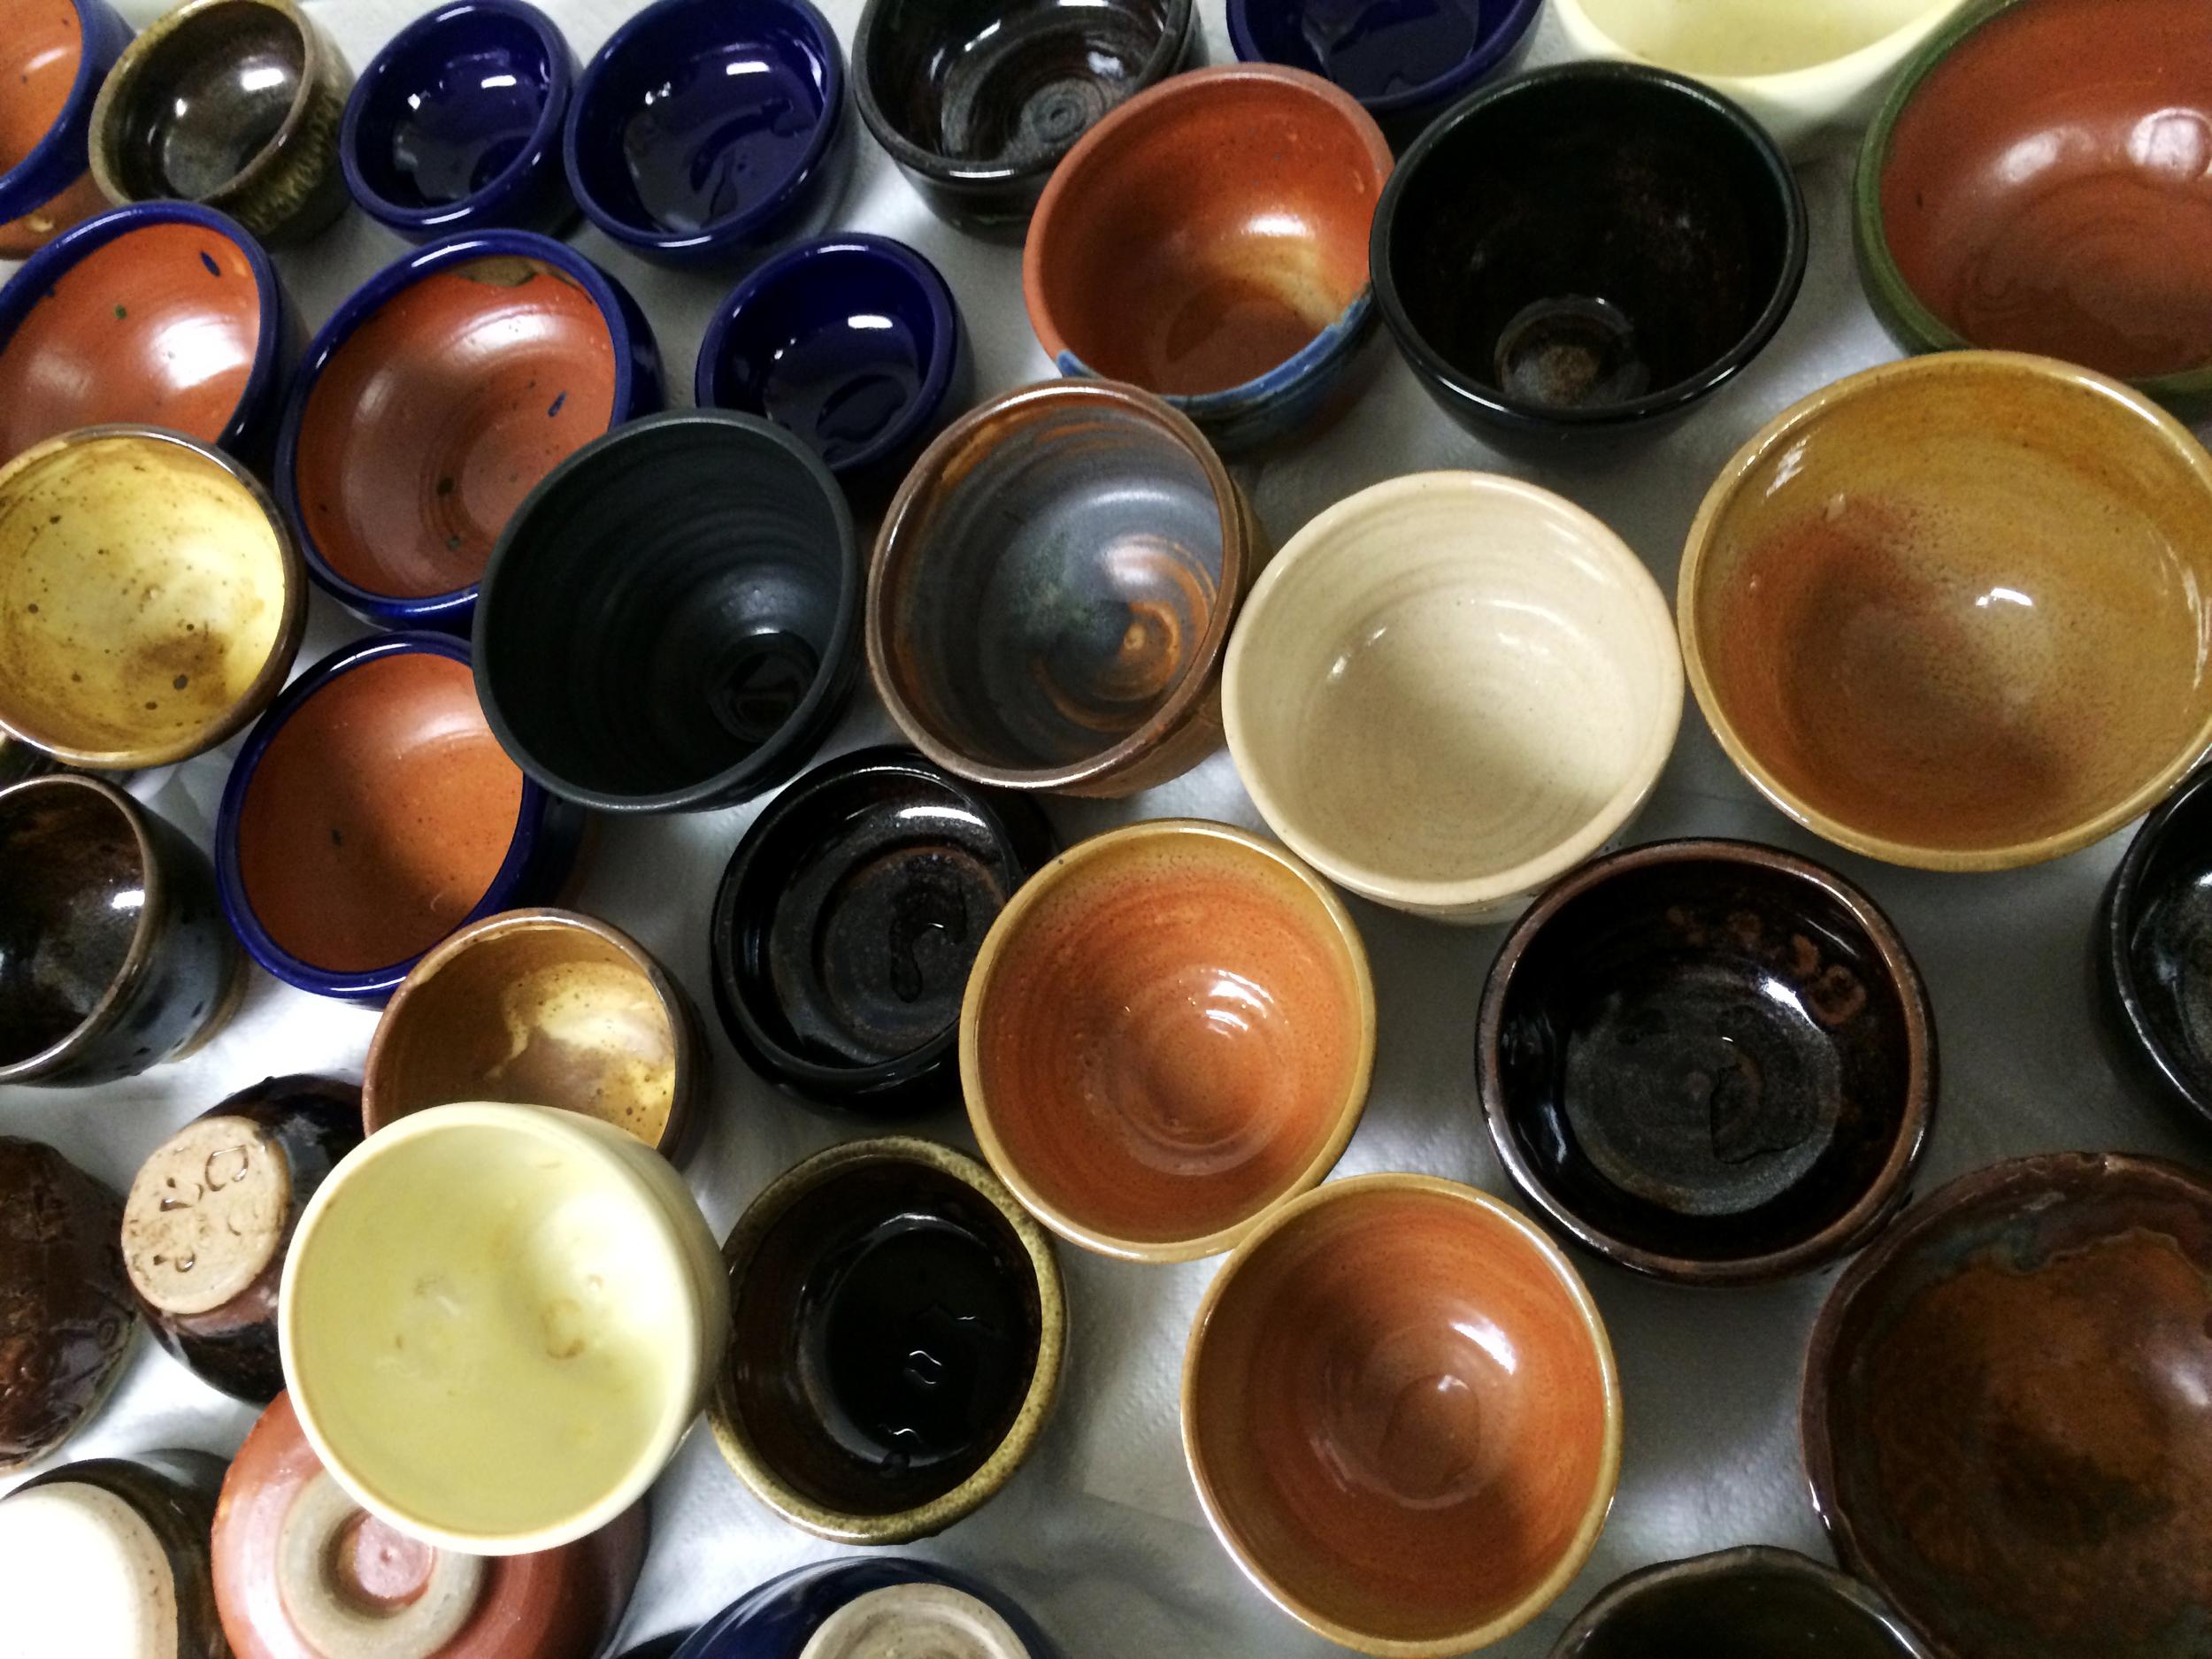 The Bathhouse Ceramic Studio